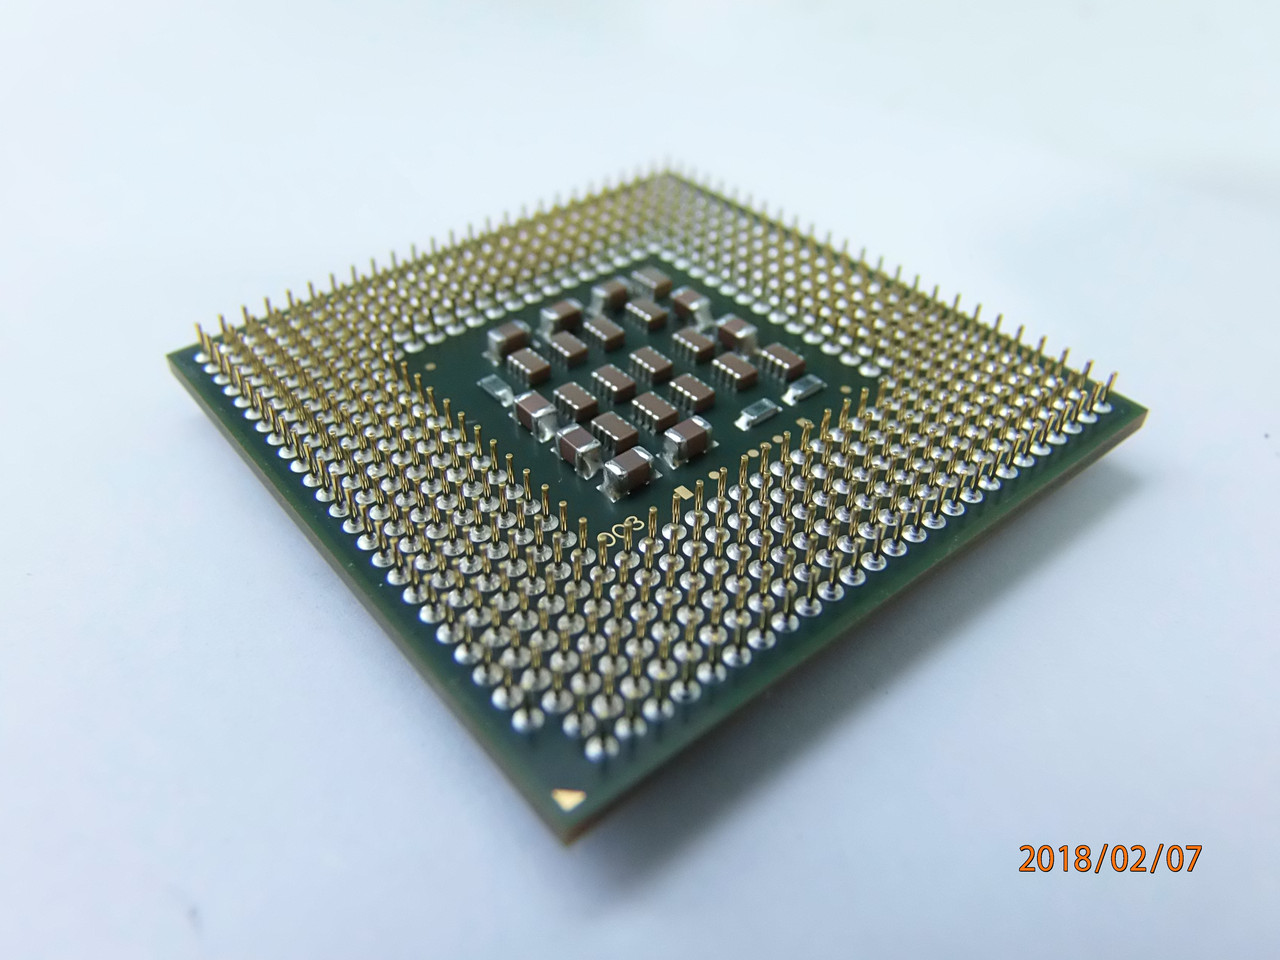 Процессор Intel Celeron D 2,53Ghz/256/533/1.250V-1.400V SL7ND